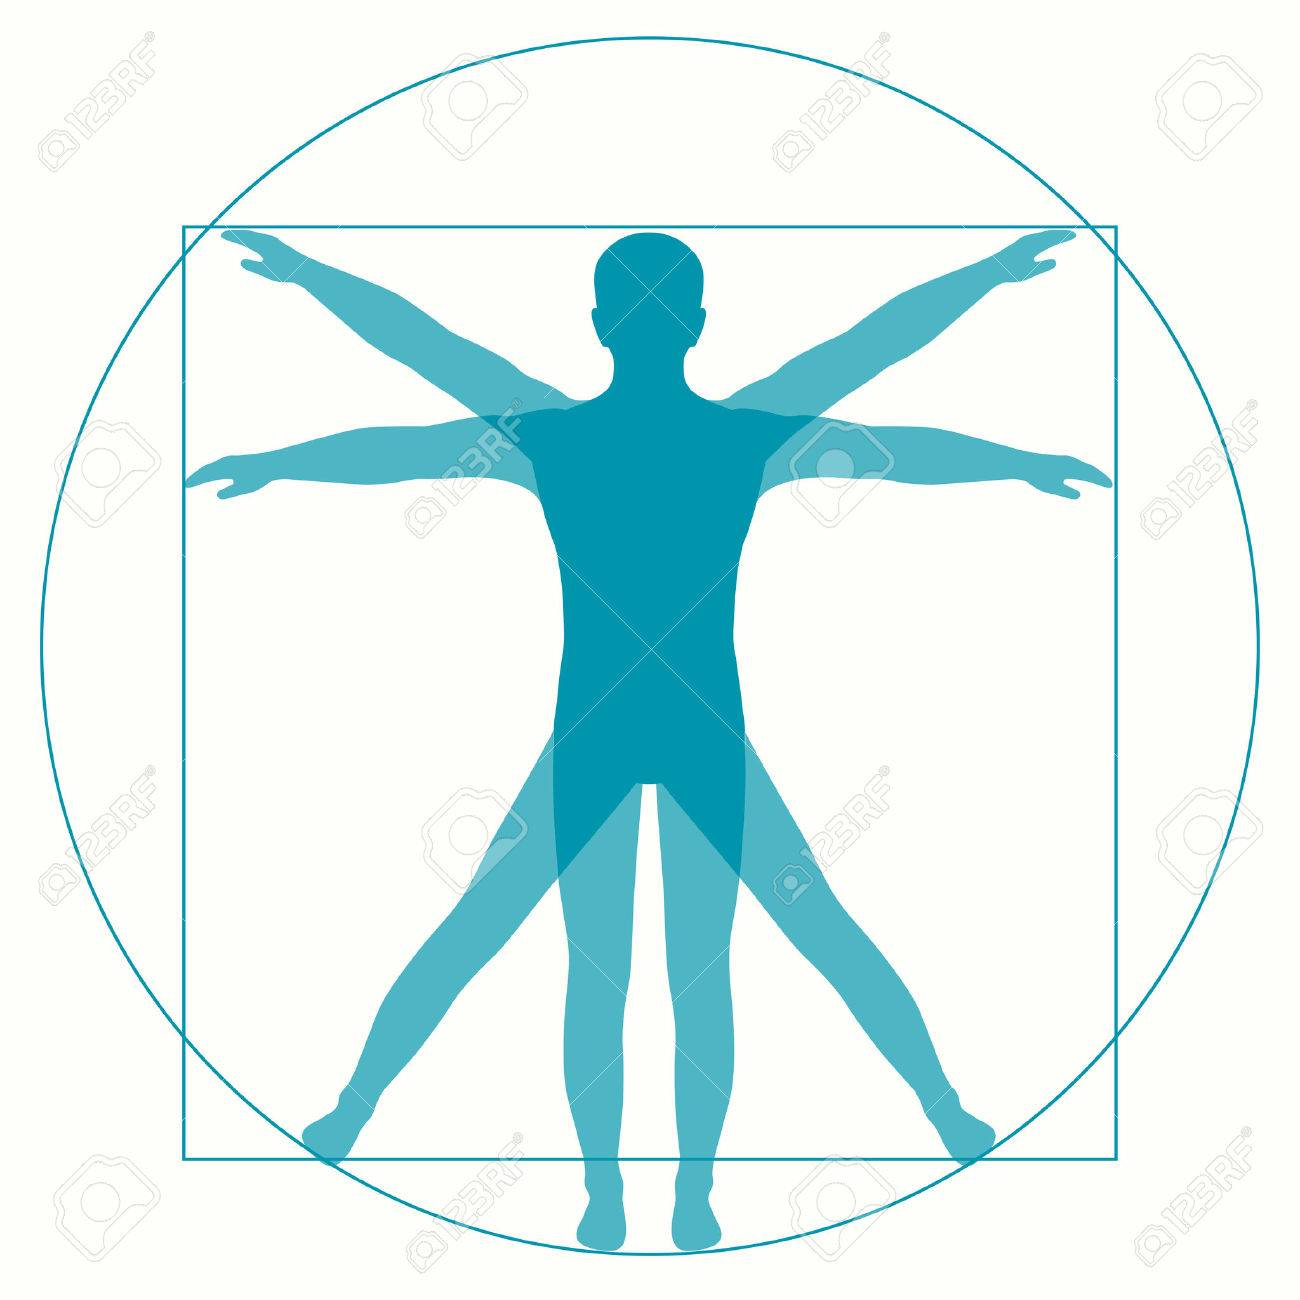 vetruvian 男 leonardo ダ ・ ヴィンチ人体解剖学 ロイヤリティフリー